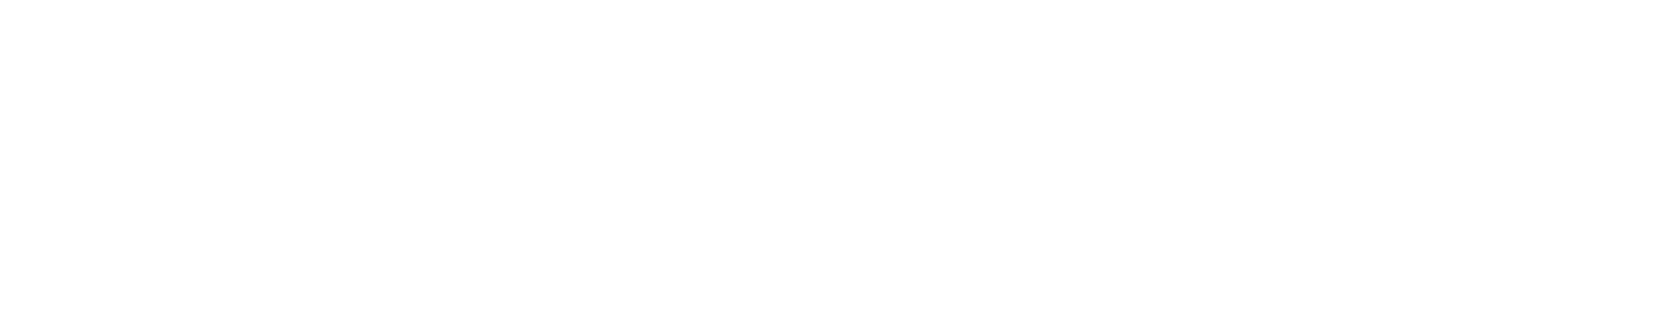 53e0ed19cffdc16b24d4723b_Occom_logo_final_rev.png